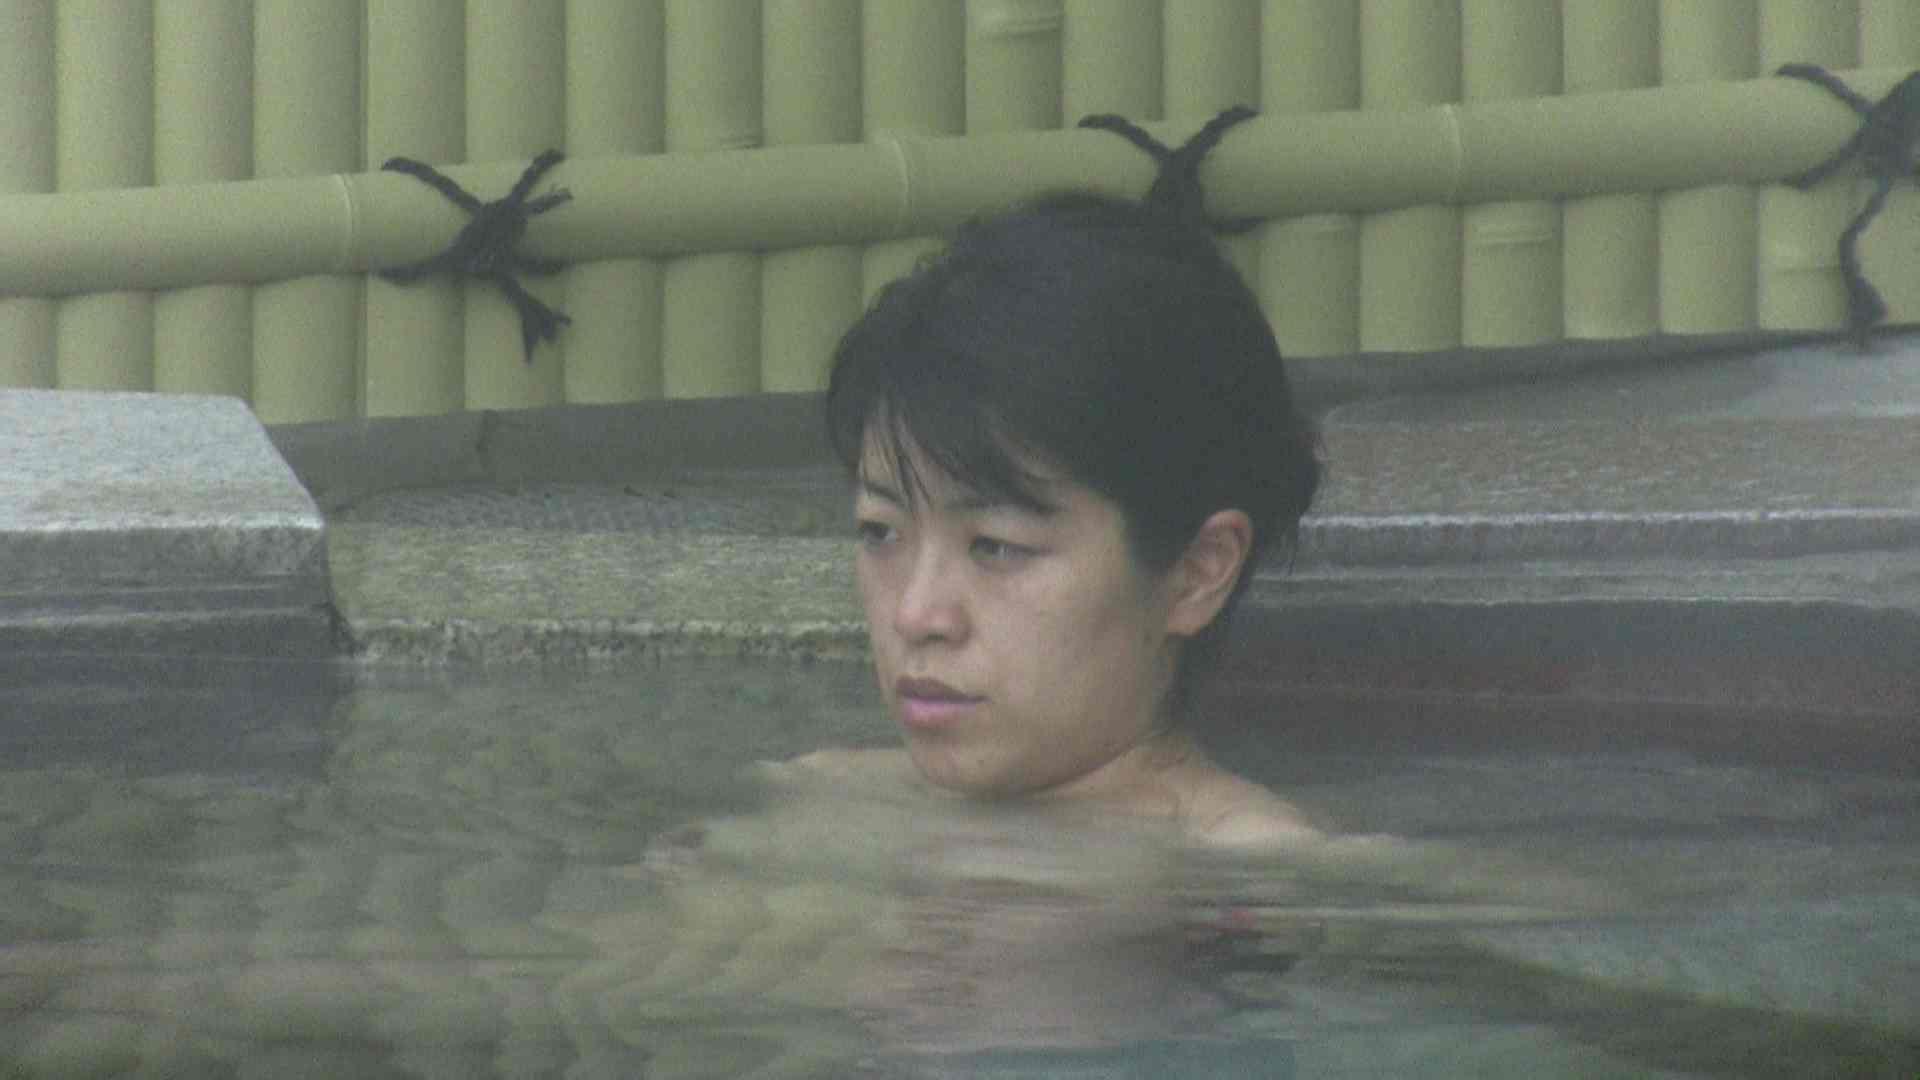 Aquaな露天風呂Vol.585 露天 オマンコ無修正動画無料 51画像 44